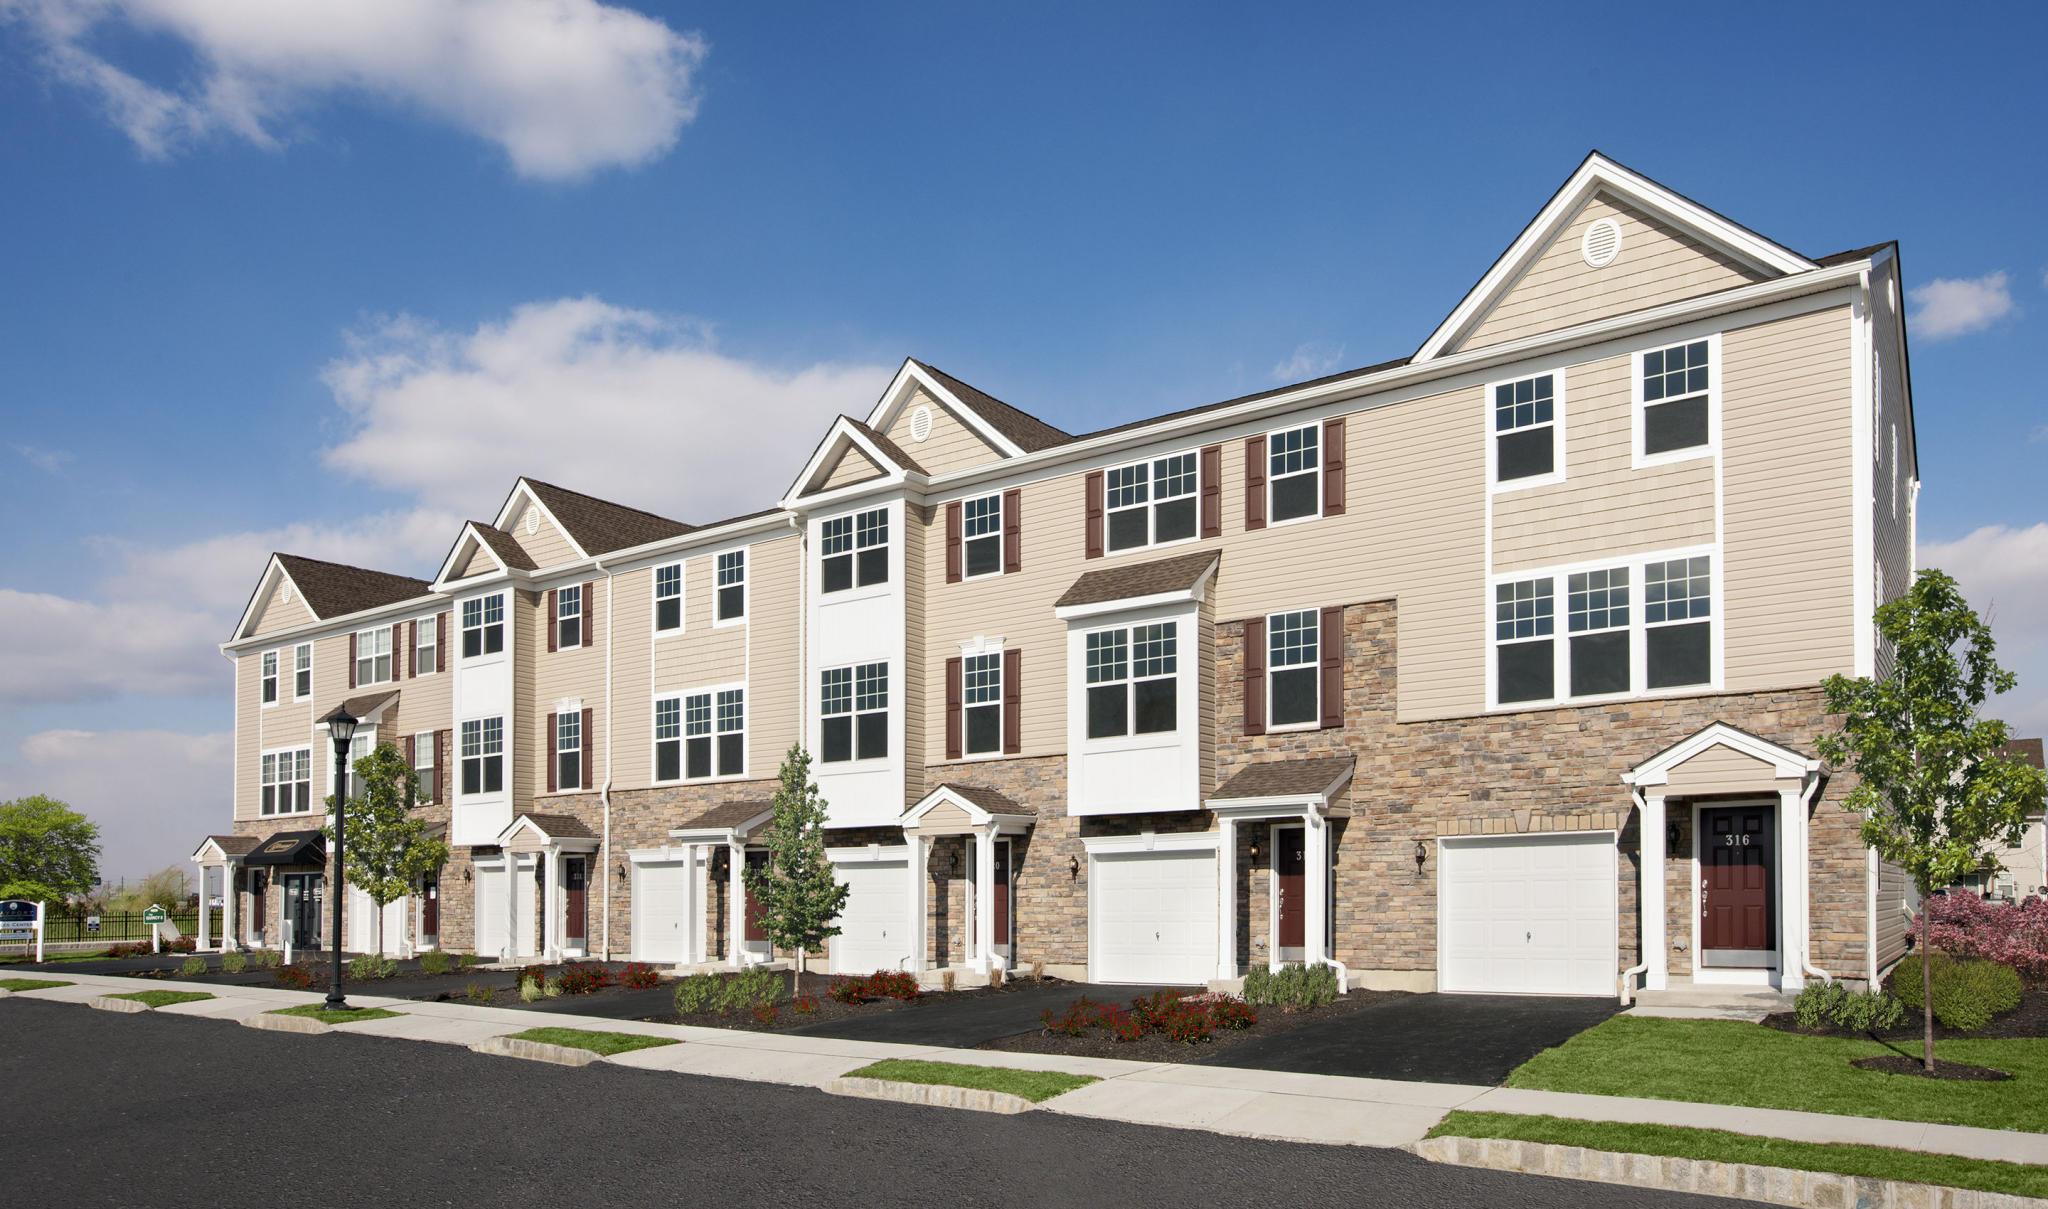 328 Sanderling Lane, Pleasantville, NJ